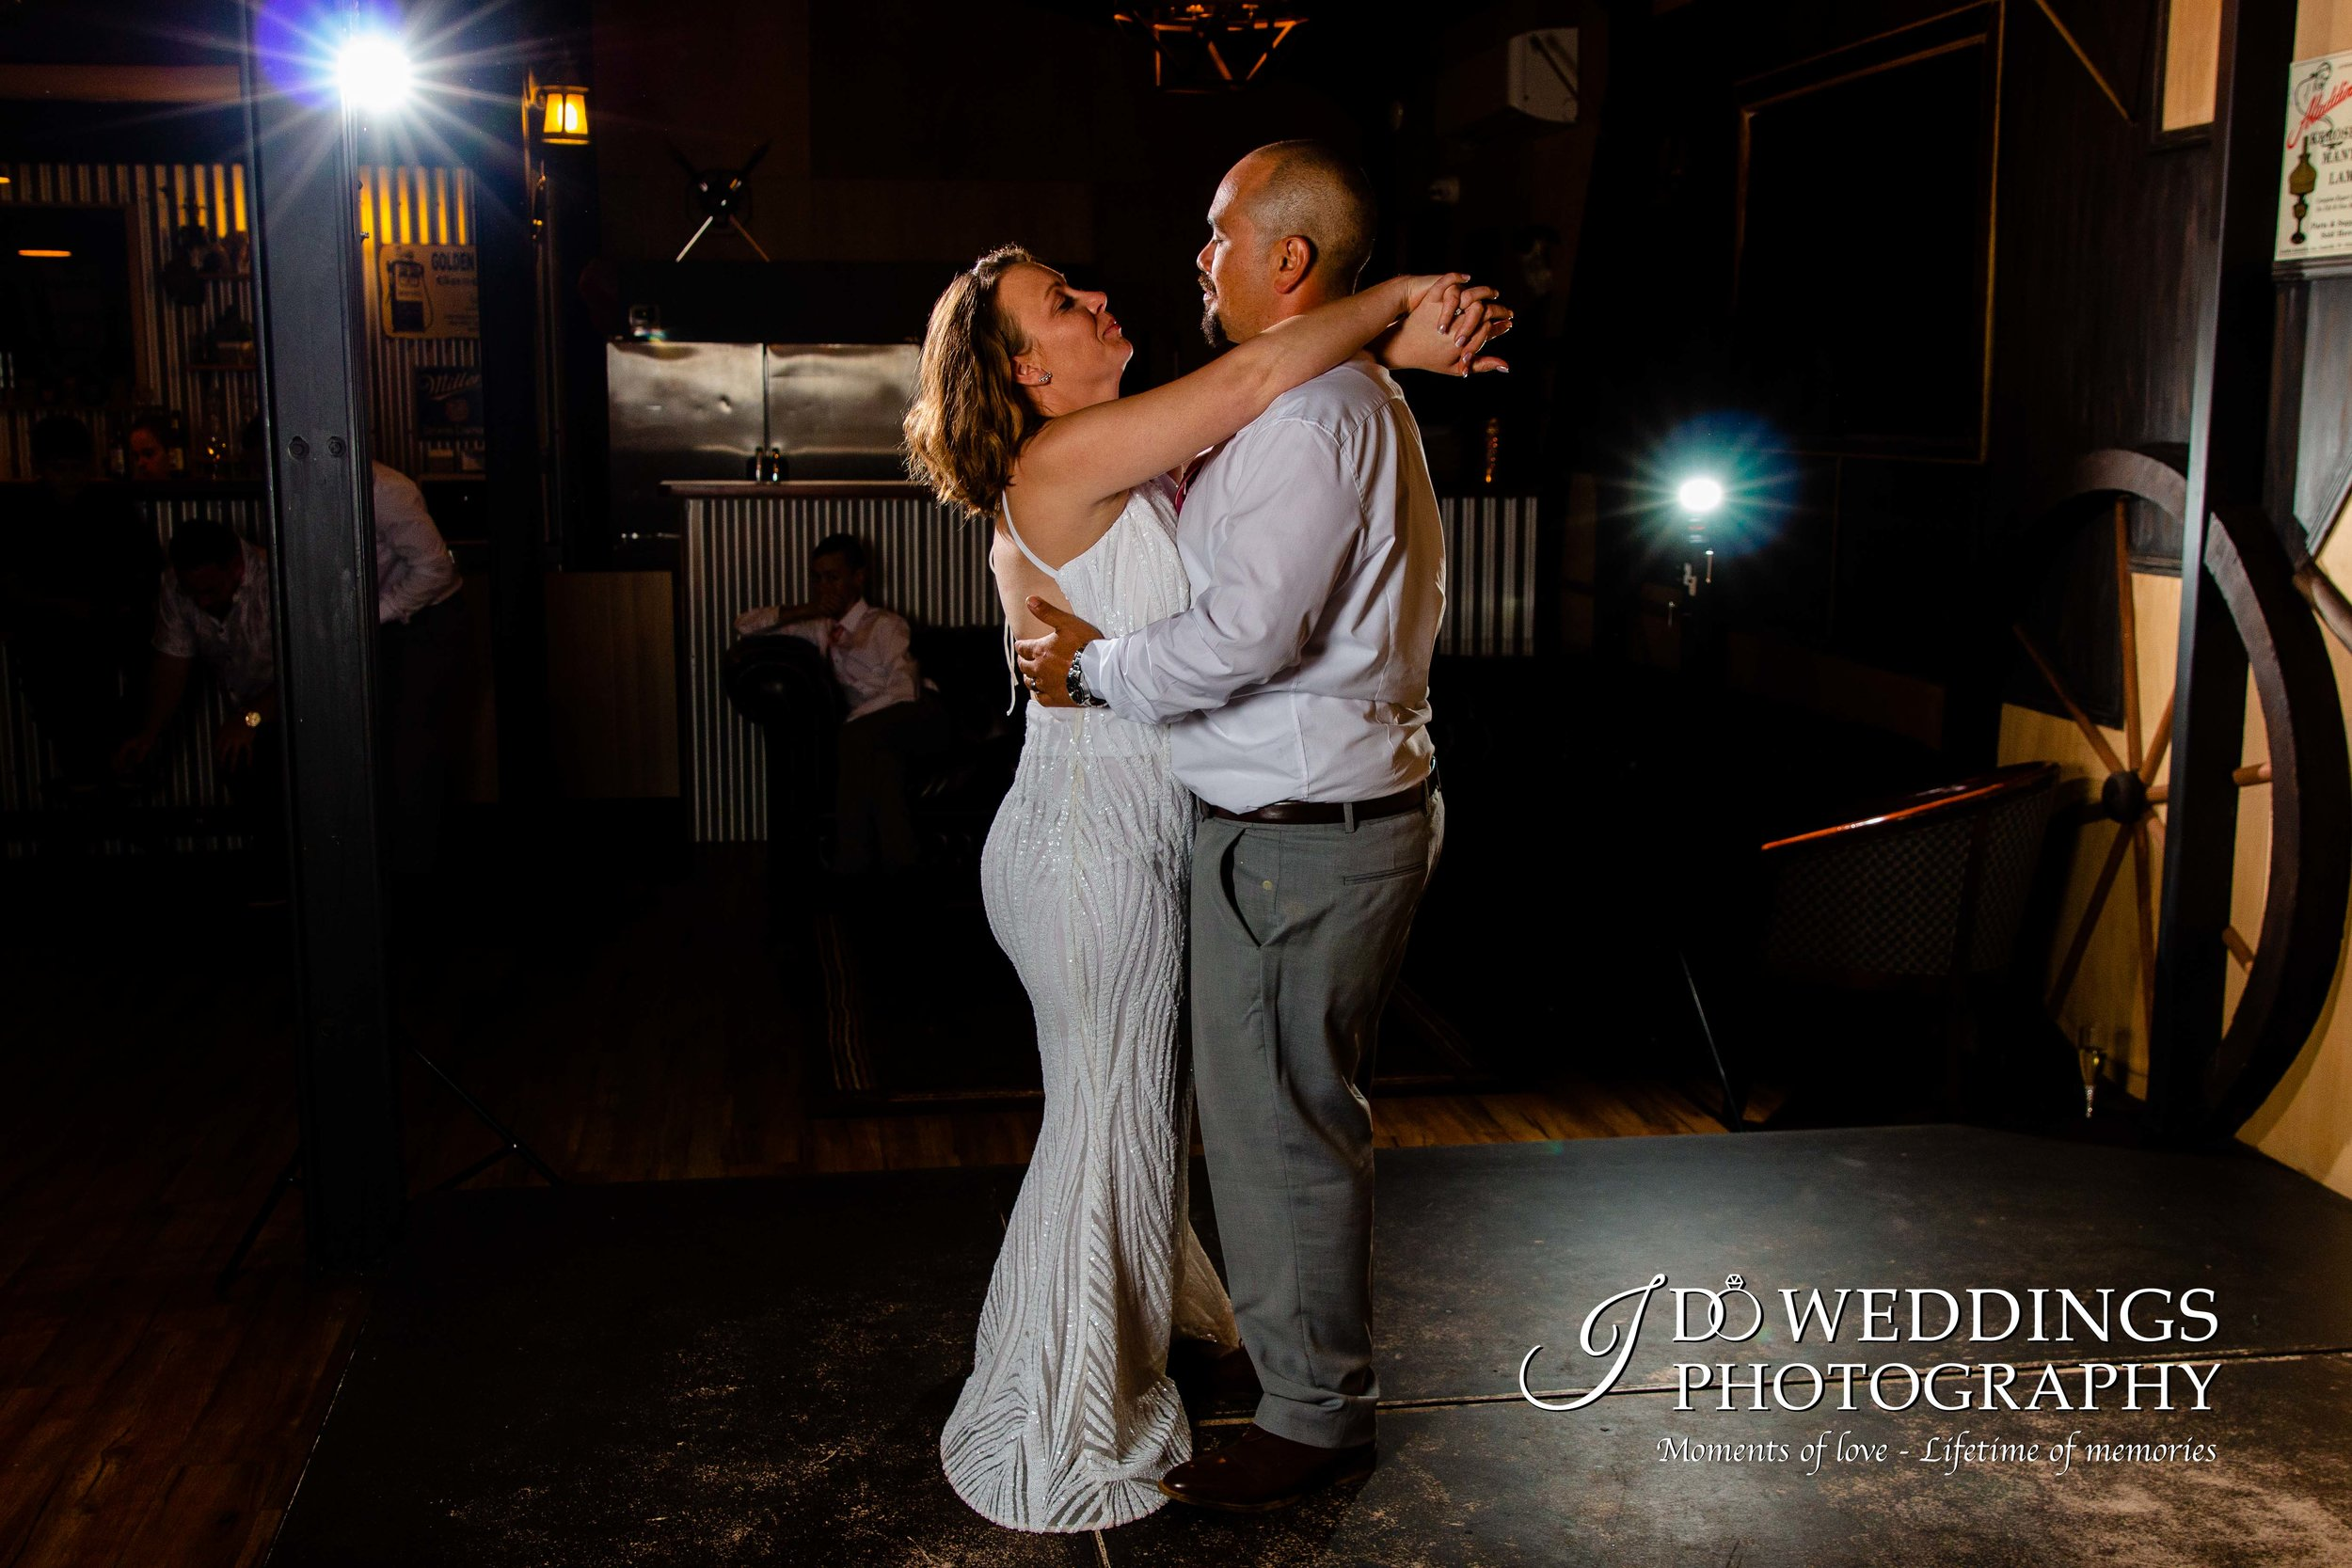 wedding images29.jpg